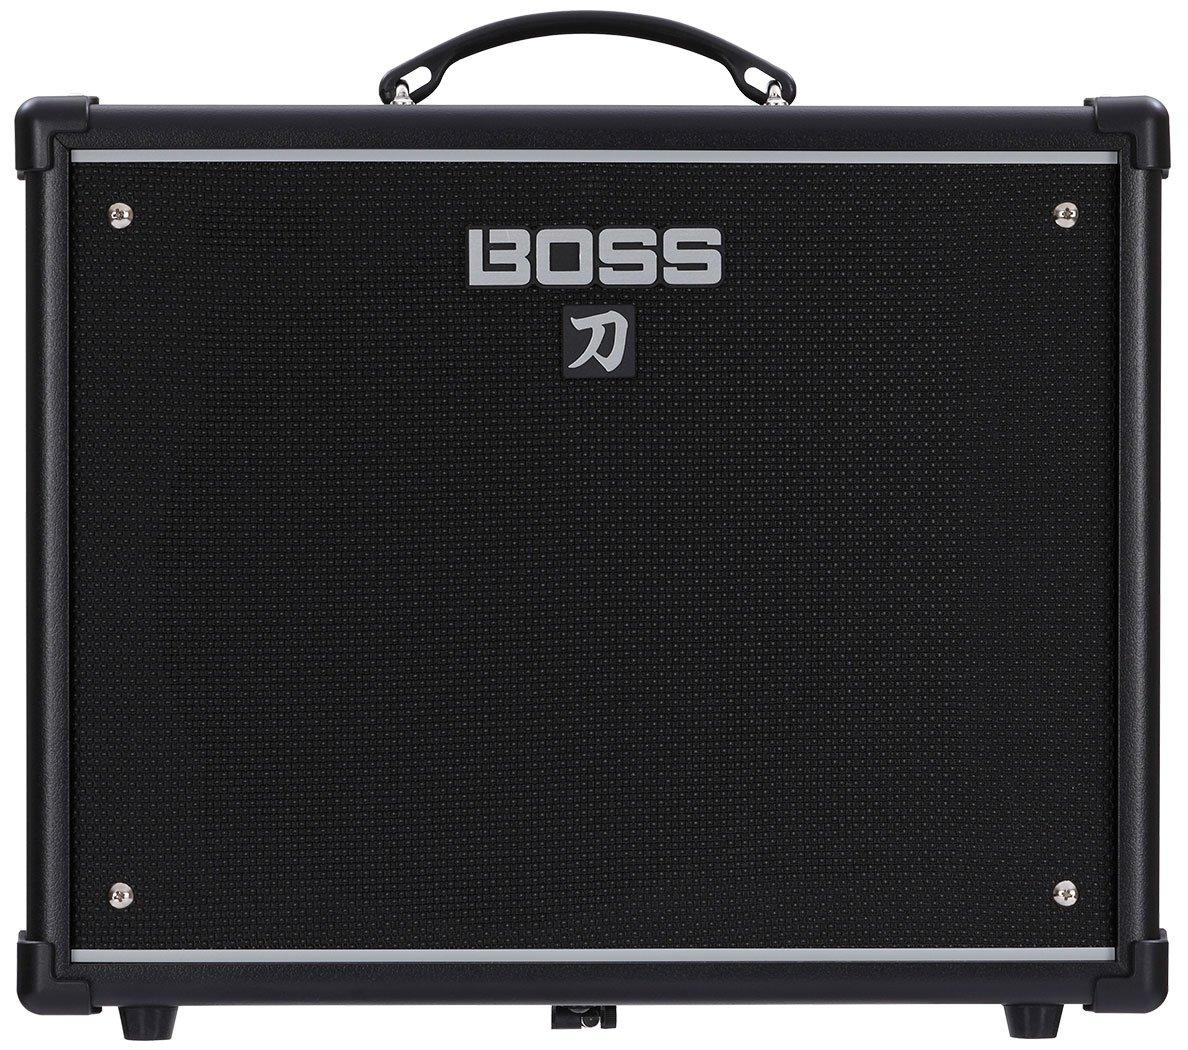 BOSS Katana KTN-50 50W 1x12 Guitar Combo Amplifier Black 761294509296 by BOSS Audio